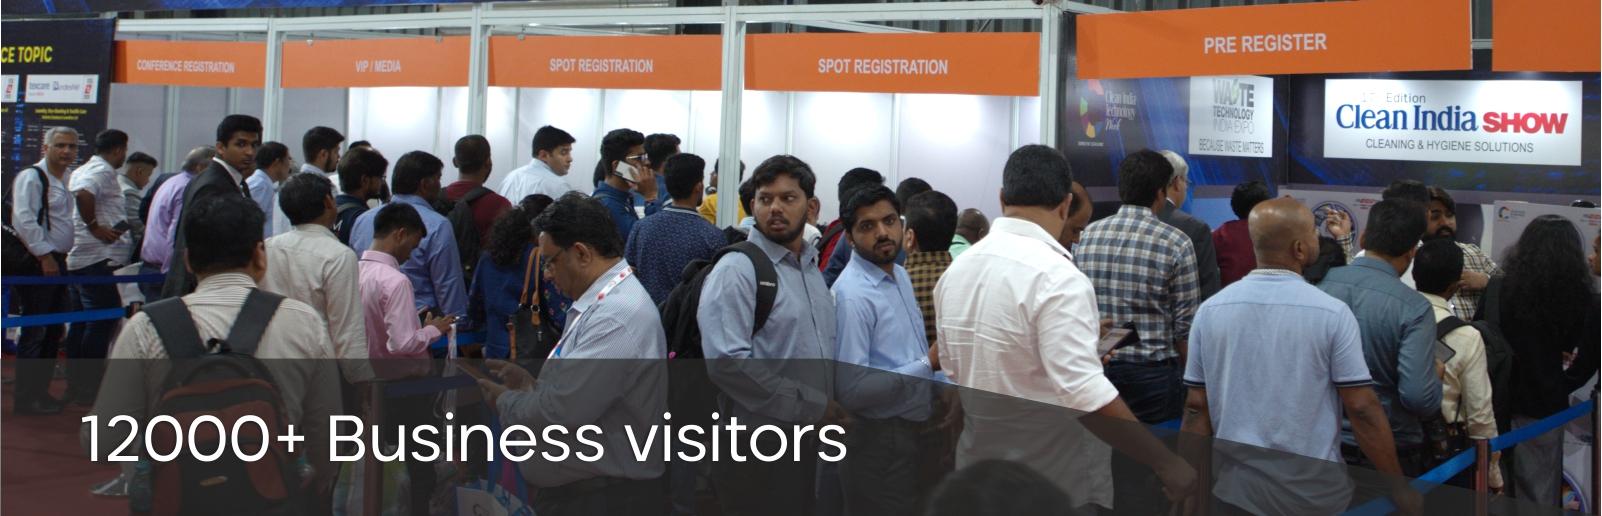 webbanner_CTW2020_Business-visitors